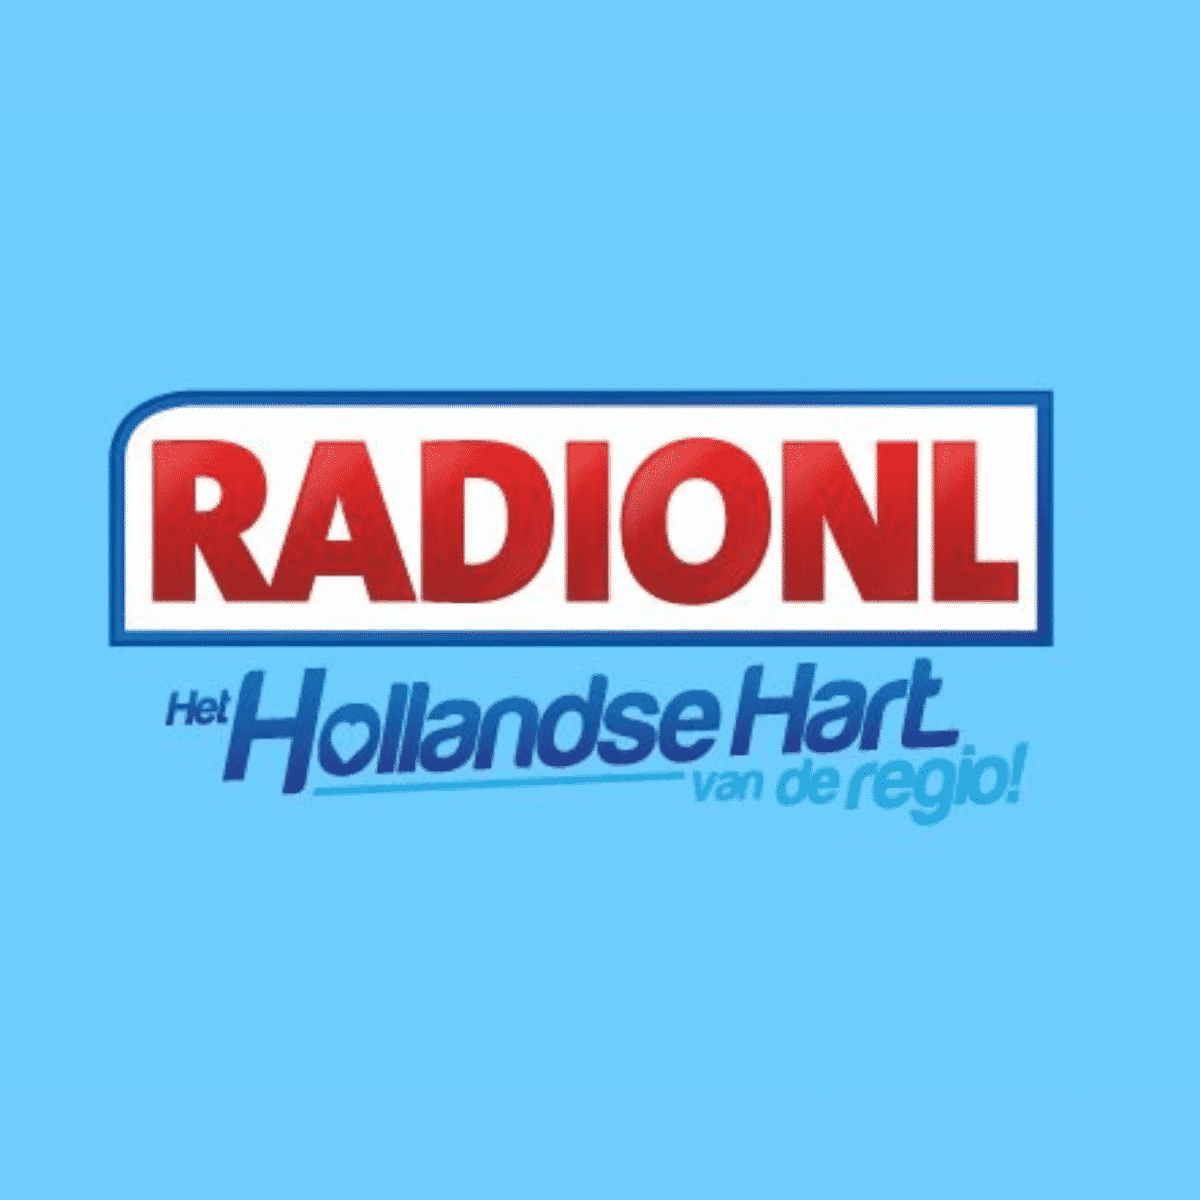 RadioNL – Hollandse Hart